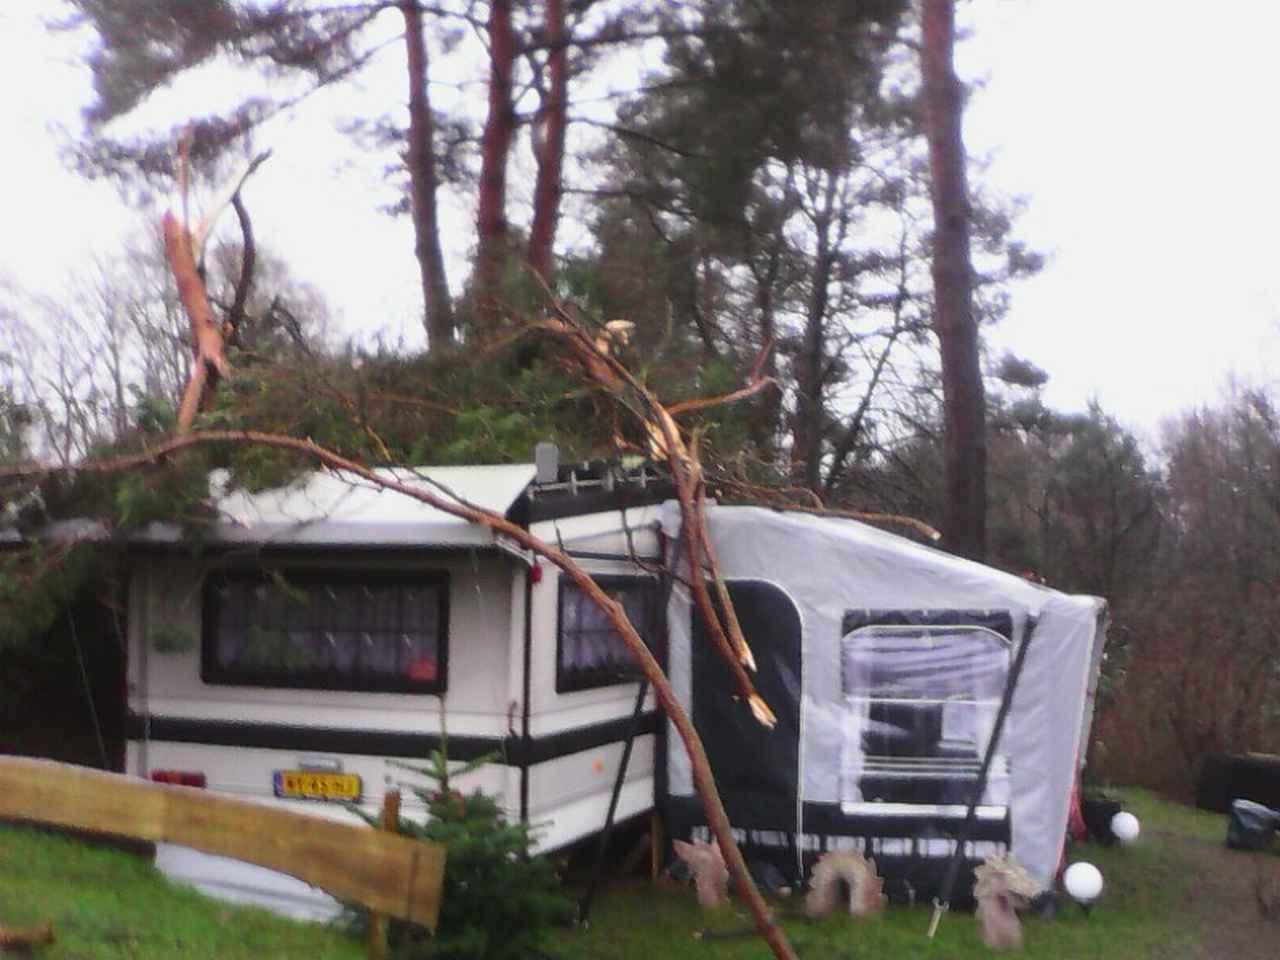 Campingversicherung Dauercamper